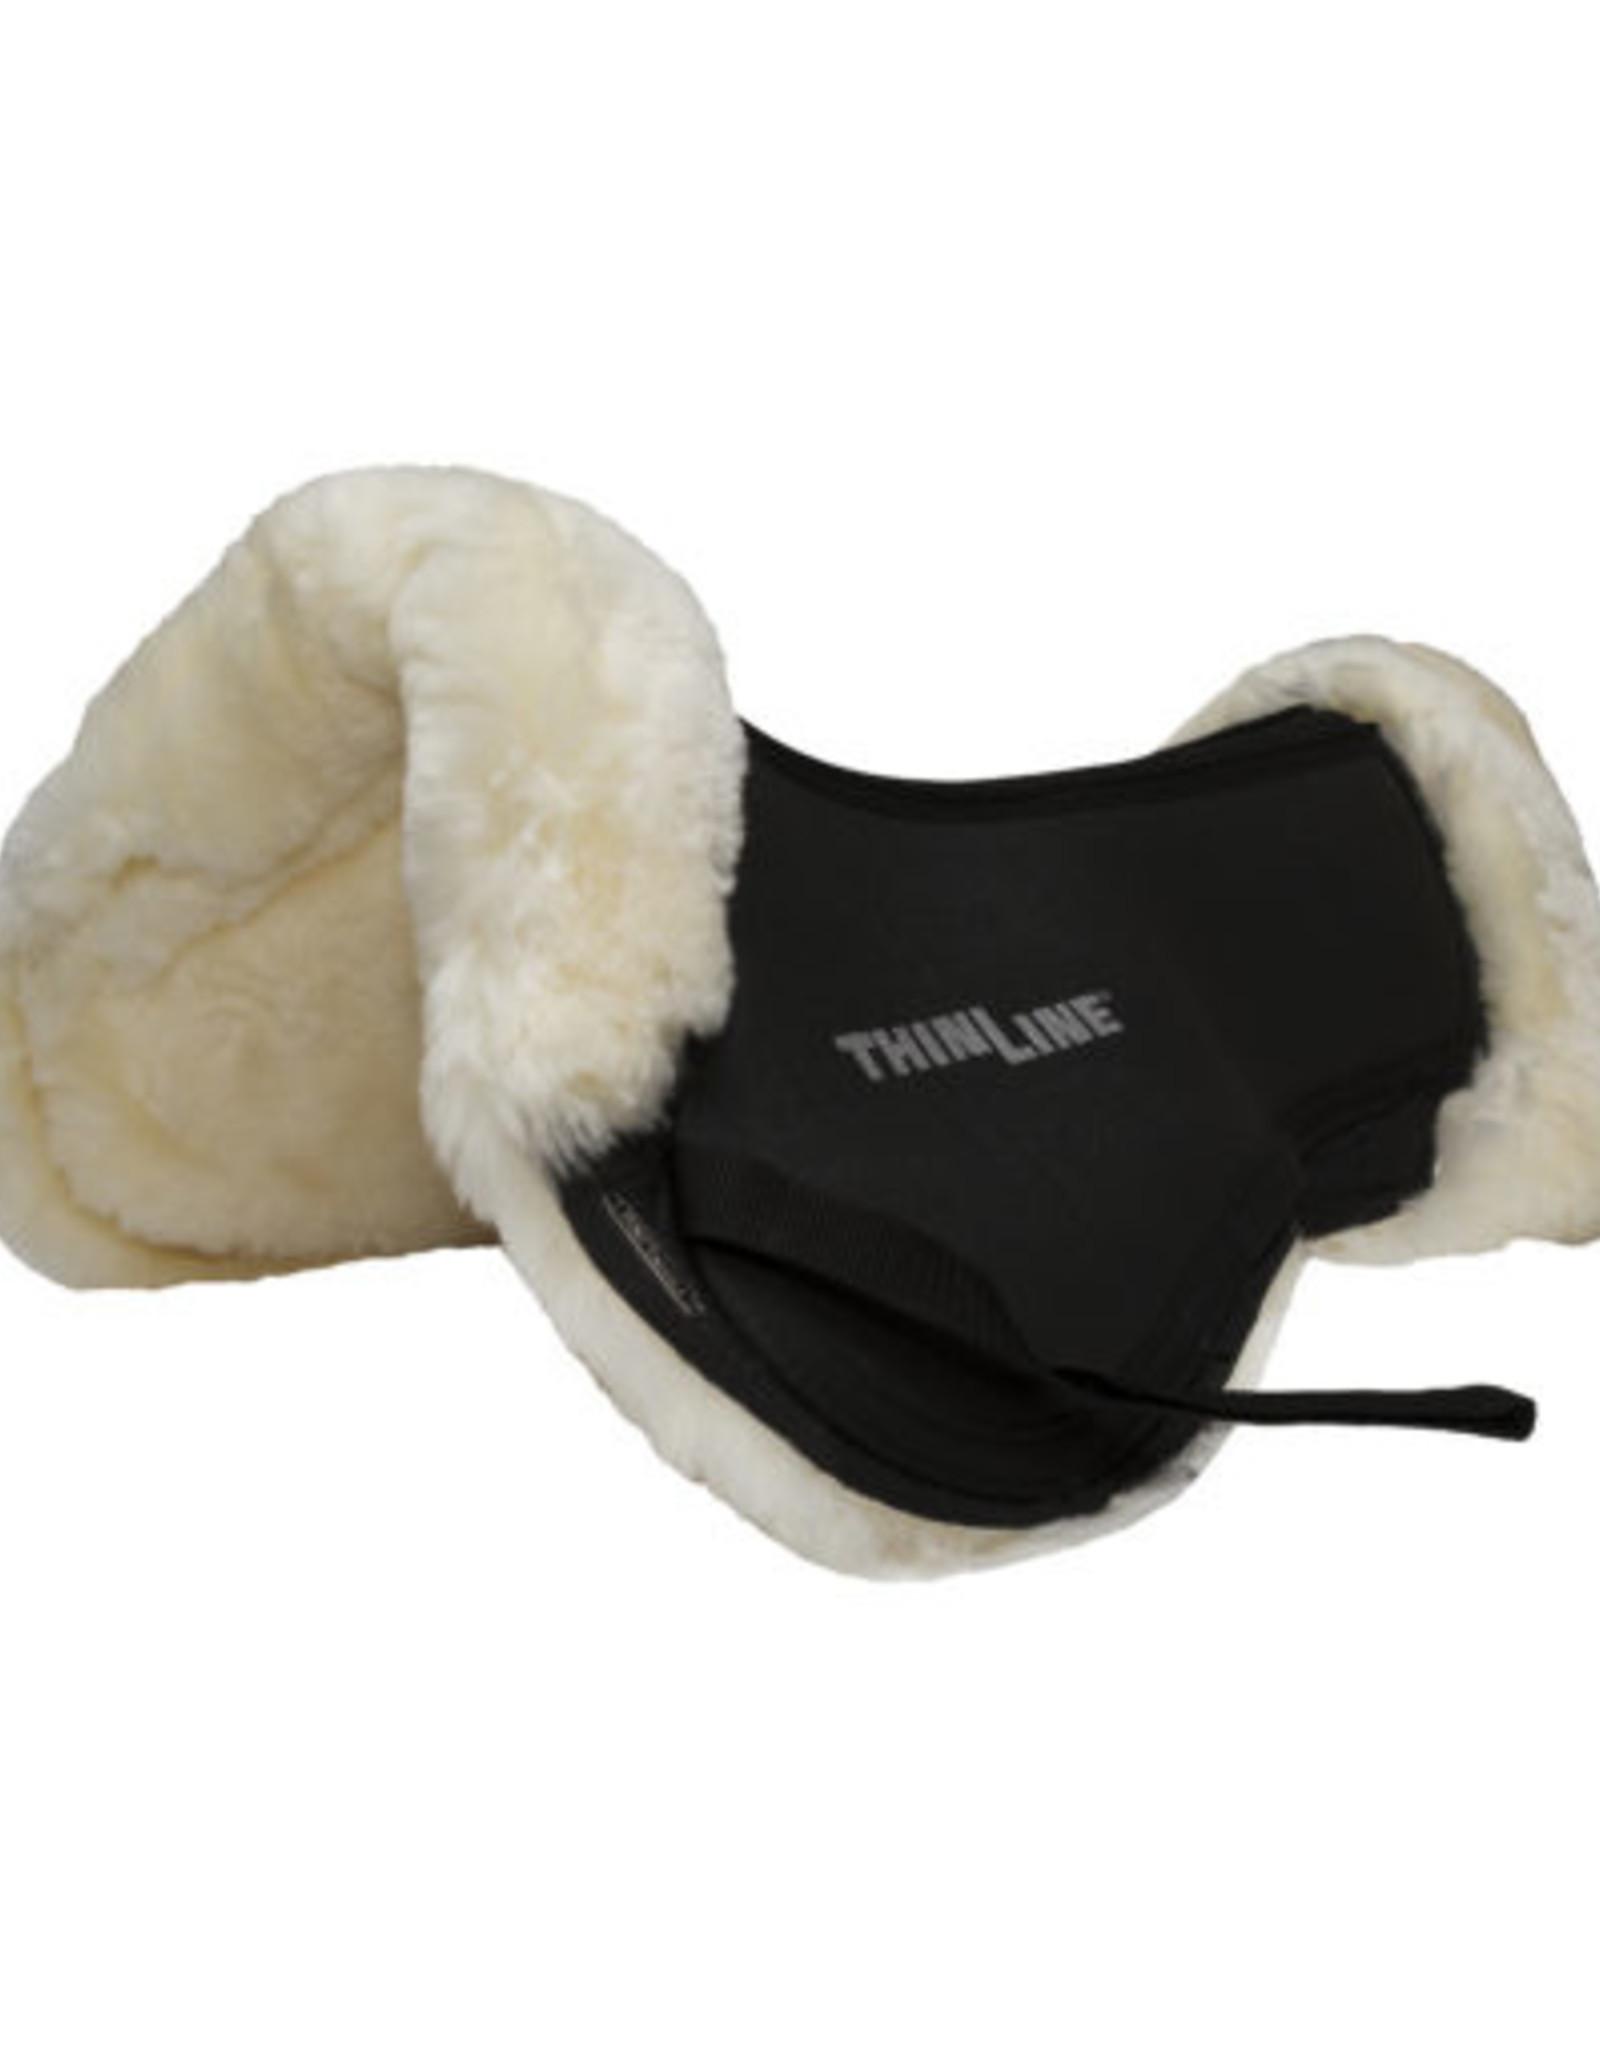 THINLINE NEW SHEEPSKIN COMFORT HALF PAD